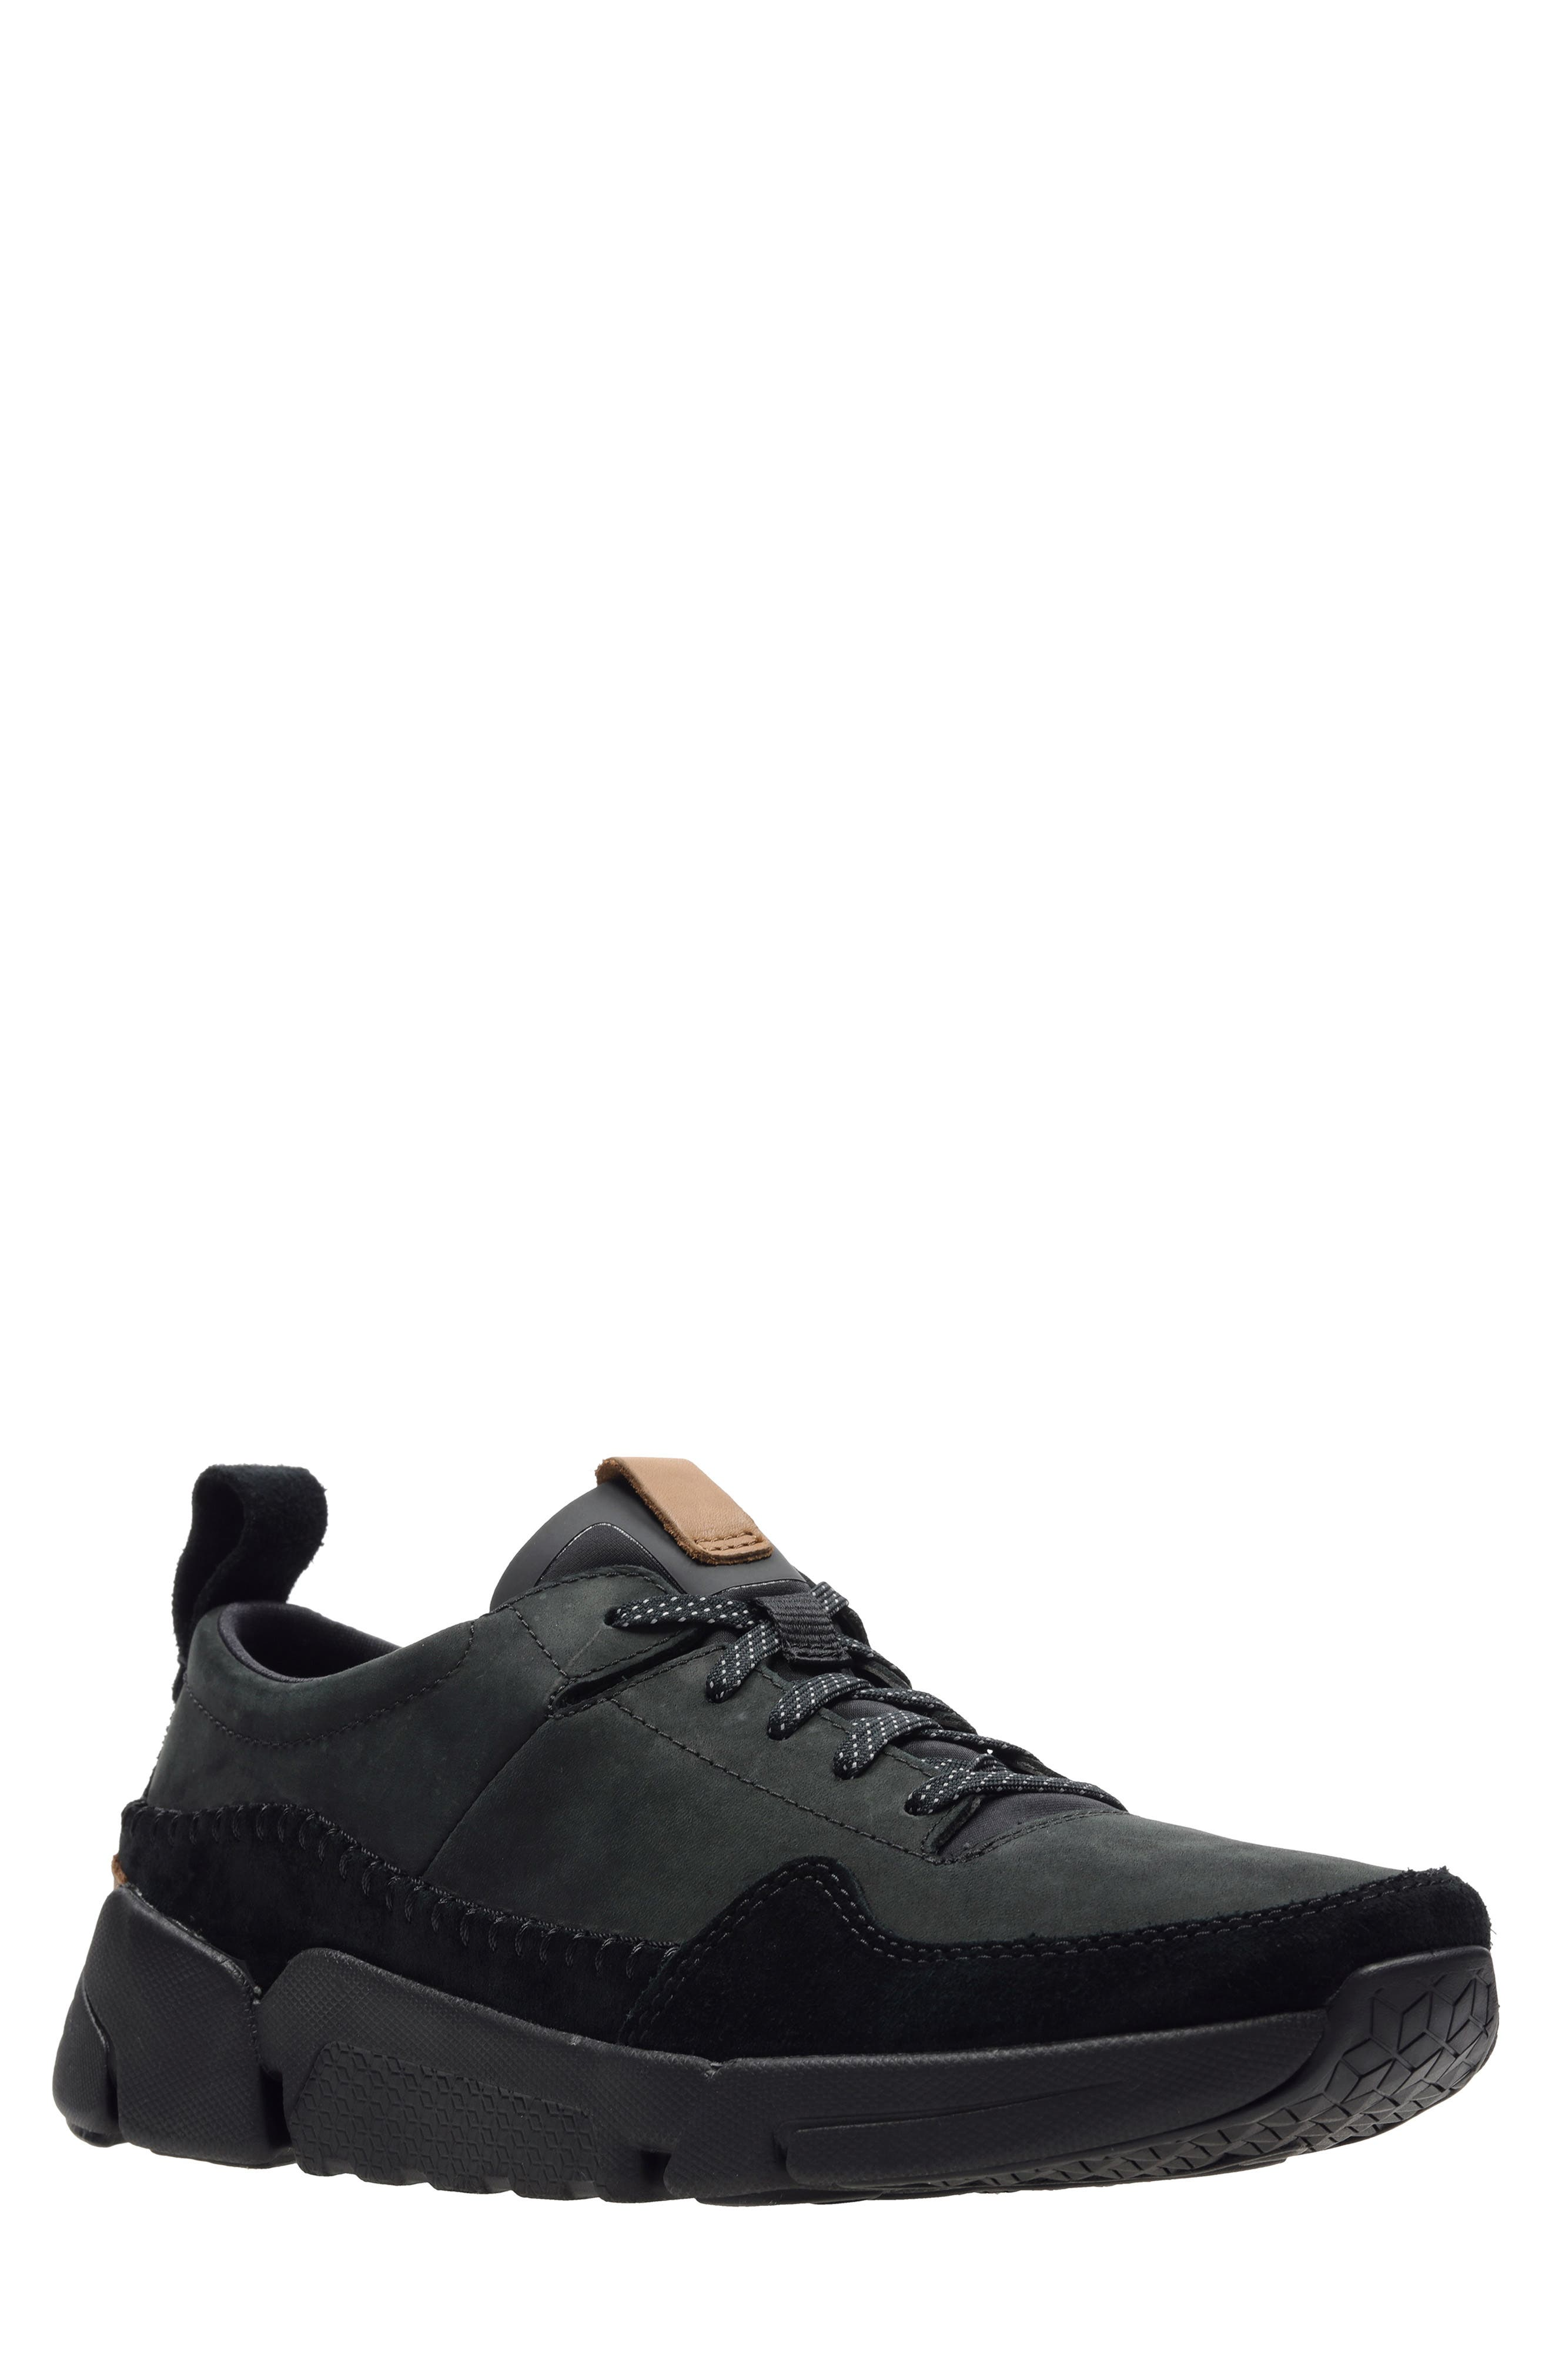 Tri-Active Run Sneaker,                             Main thumbnail 1, color,                             BLACK LEATHER